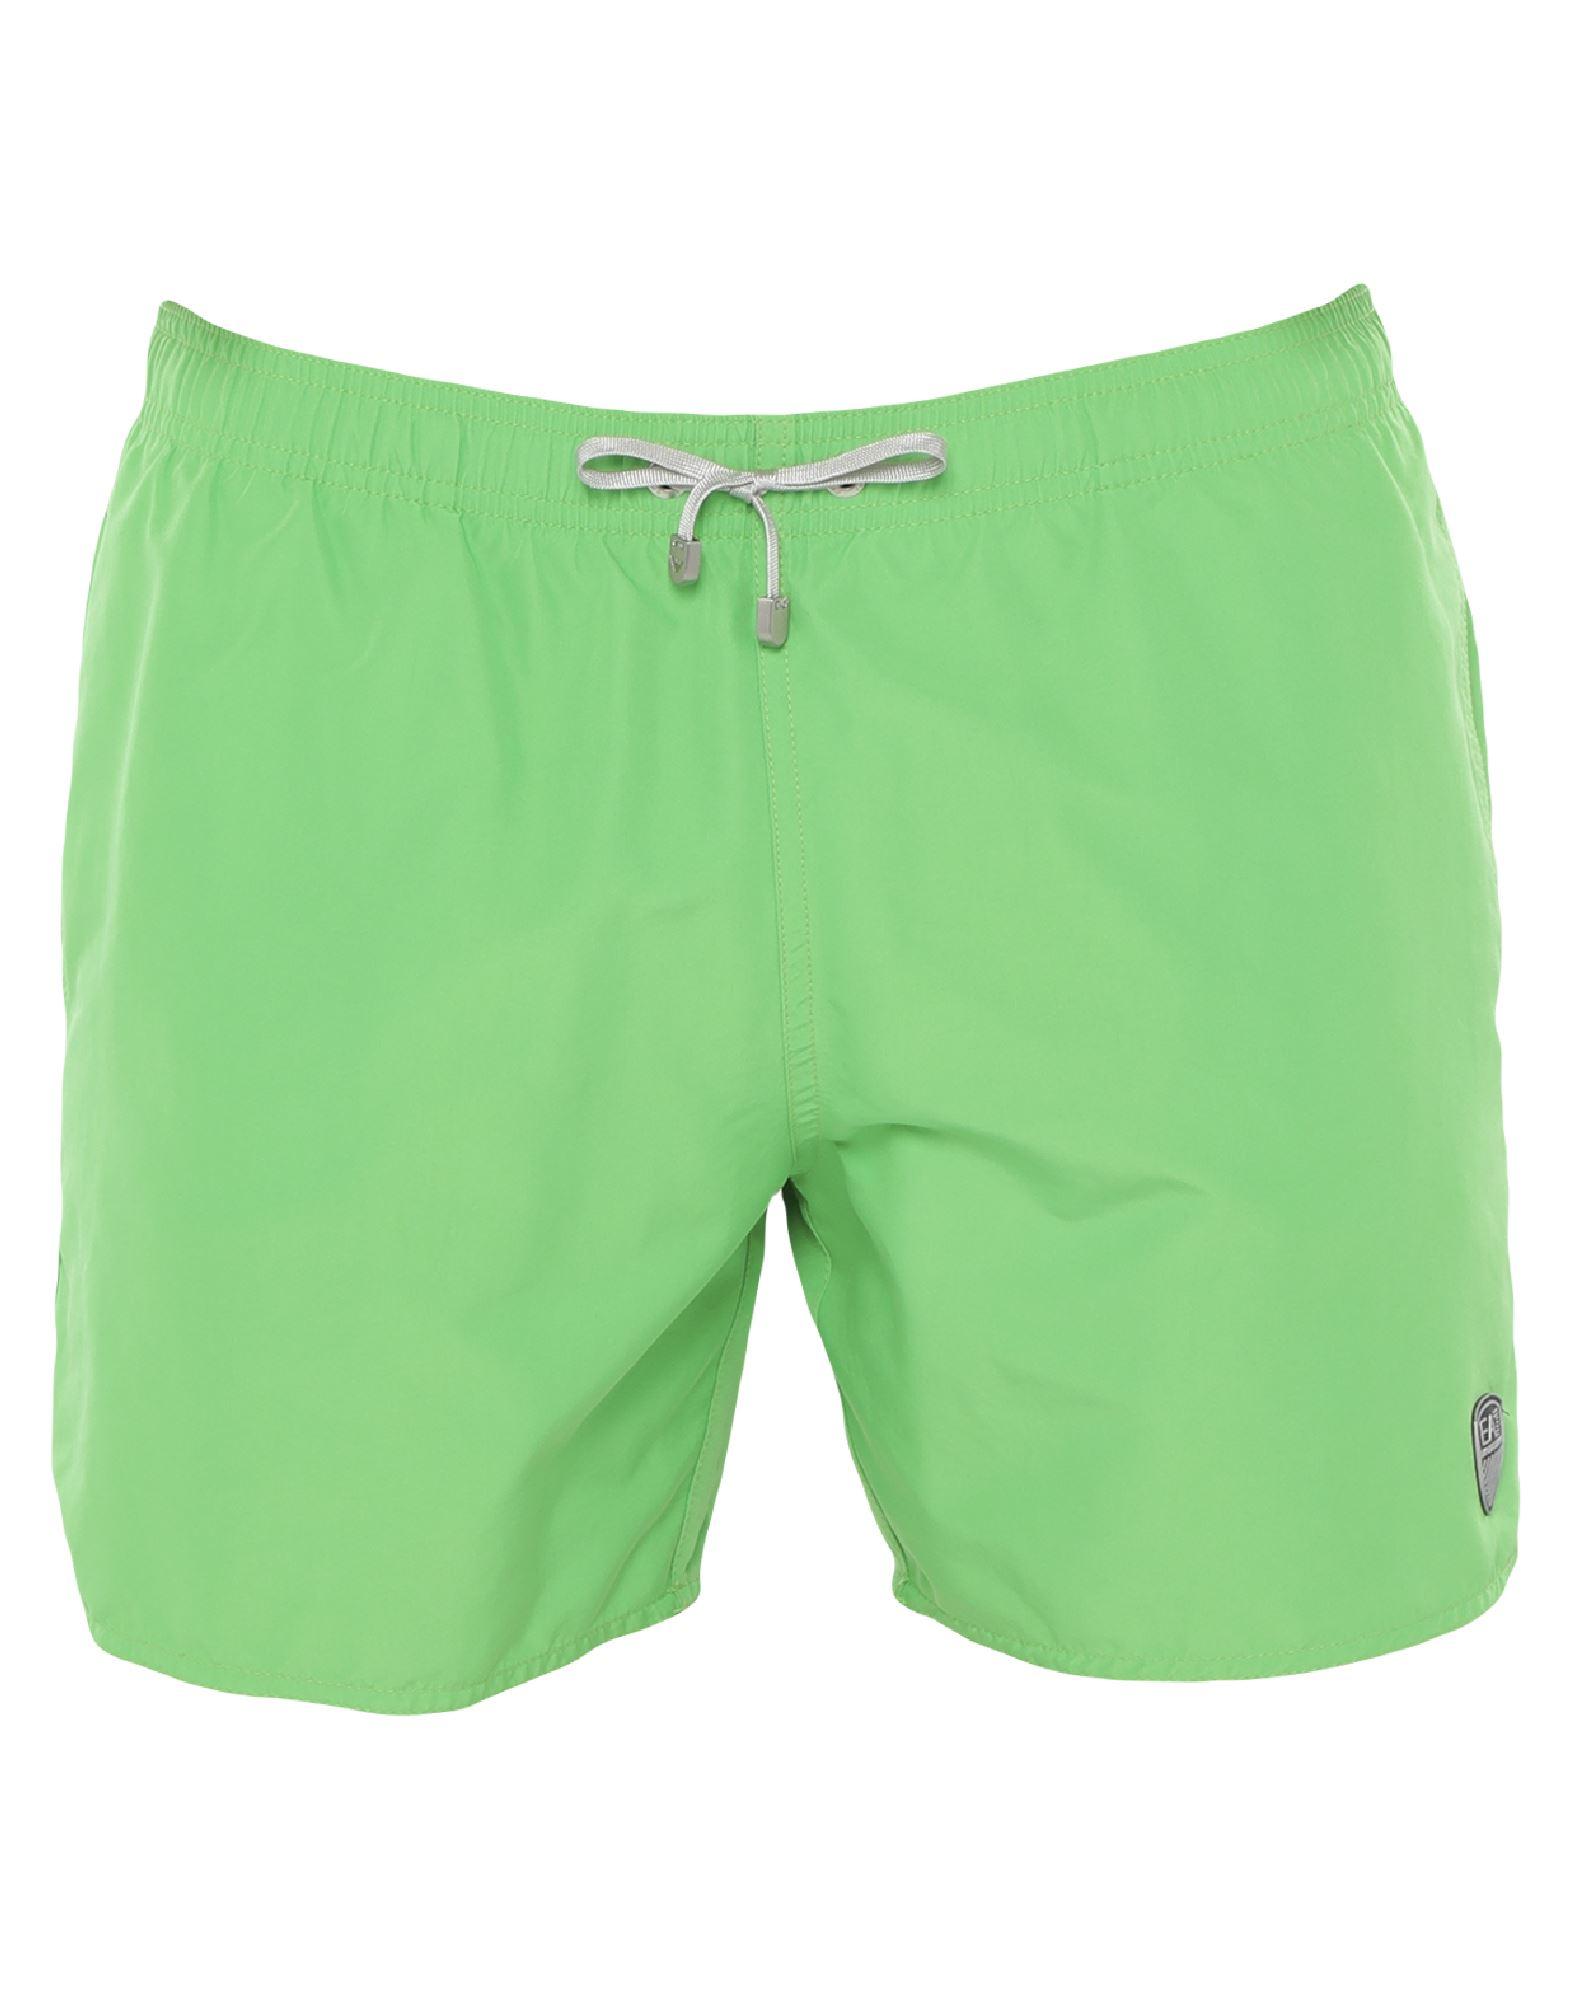 EA7 Swim trunks - Item 47273592